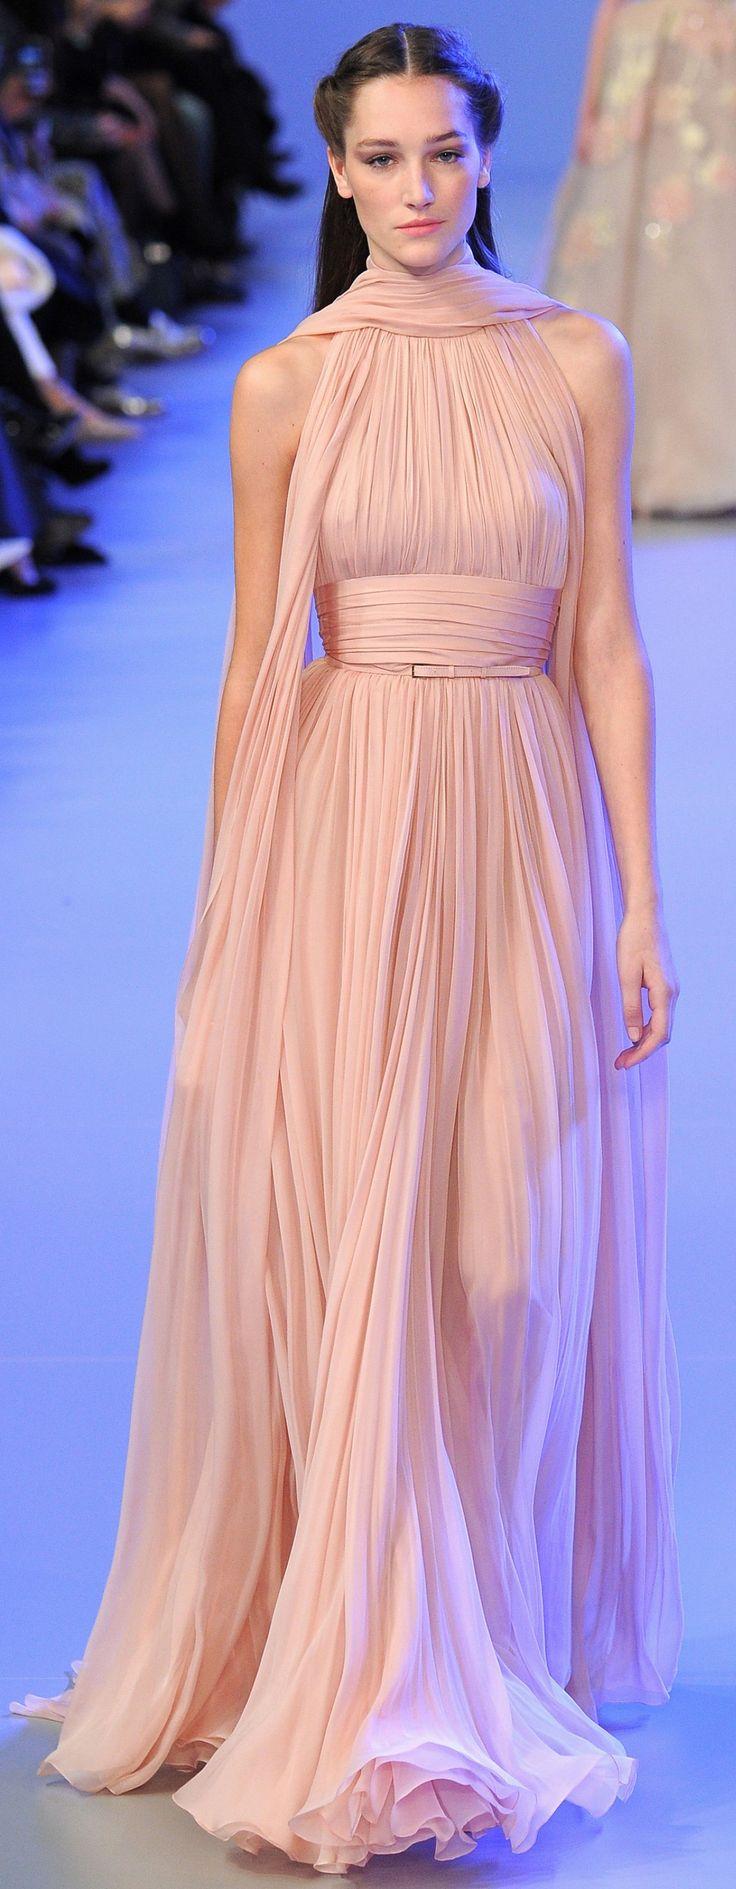 Elie Saab Haute Couture Spring 2014                                                                                                                                                     Más